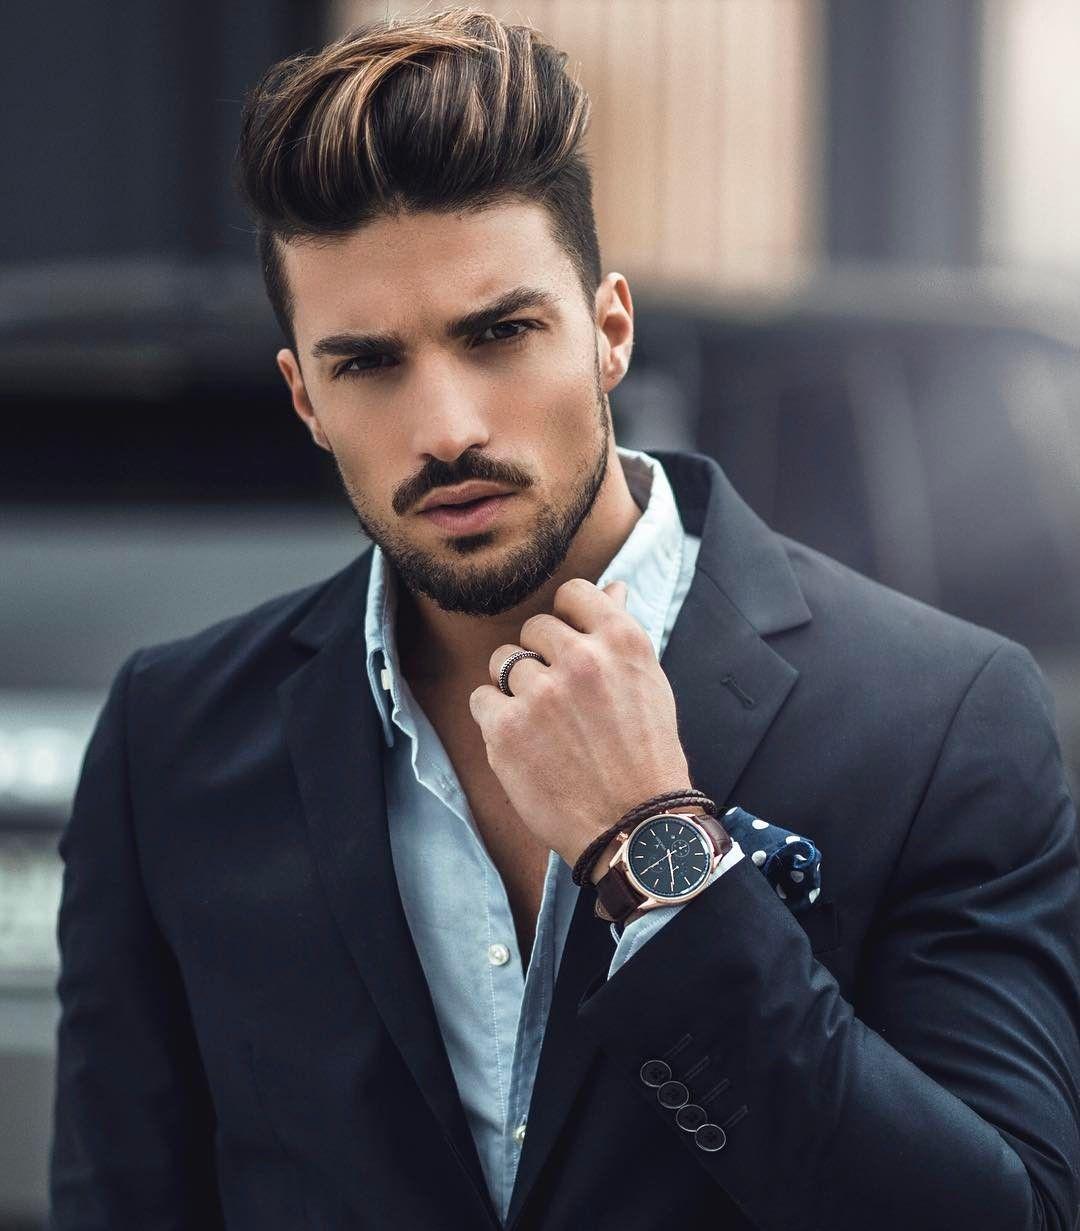 Hairstyles Highlights Men